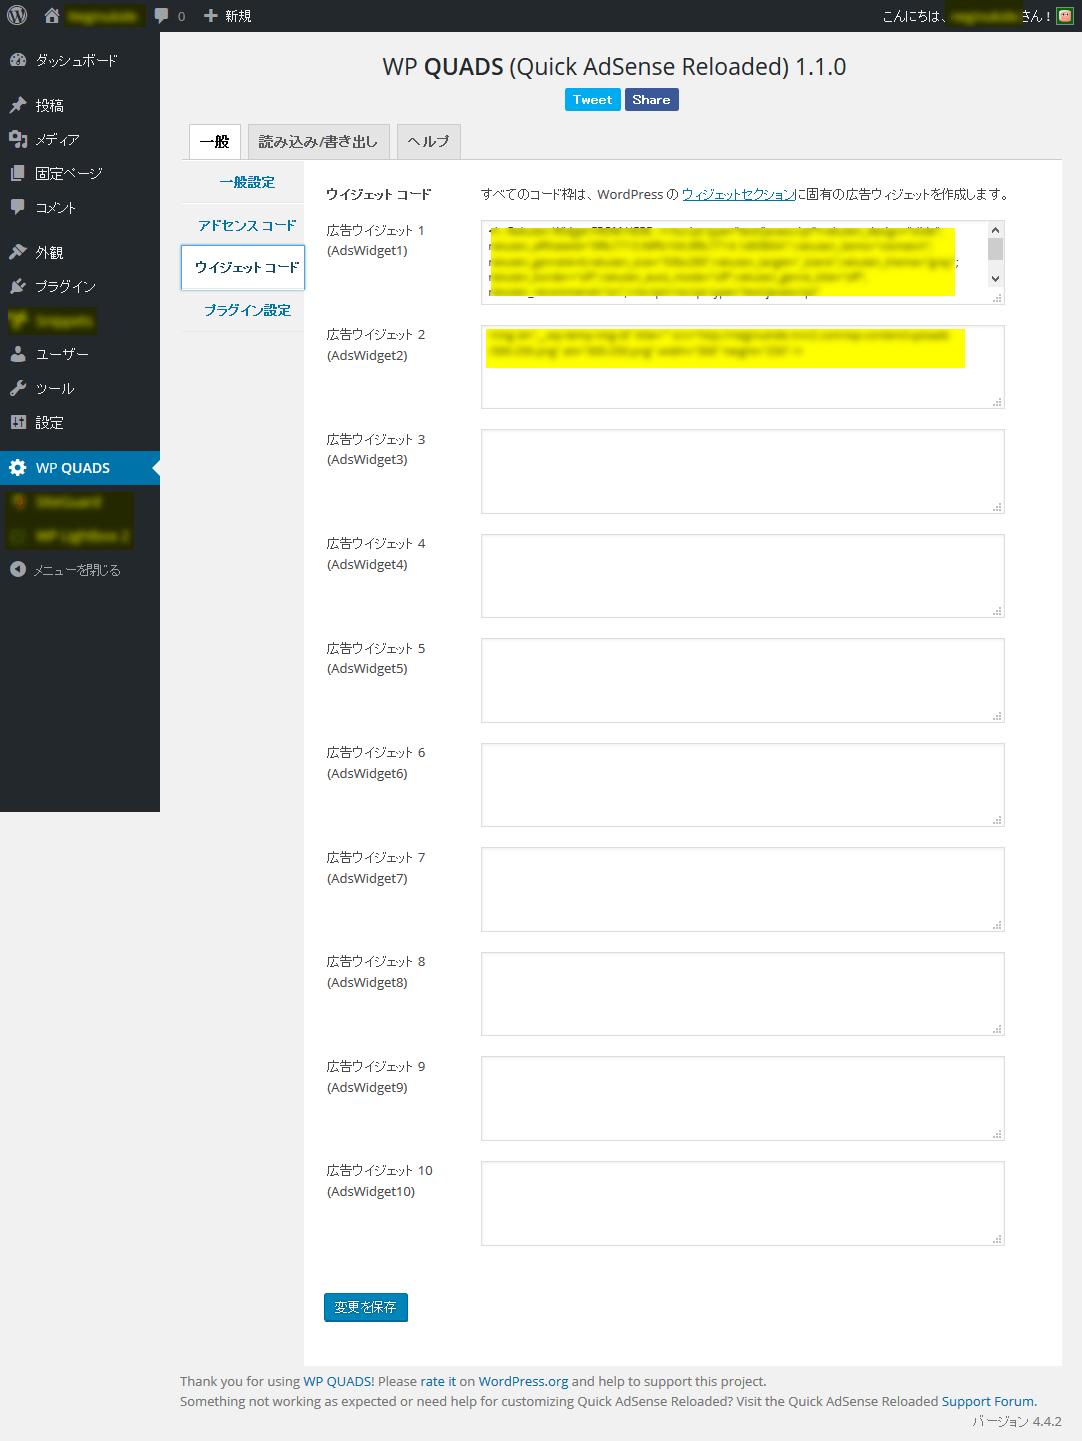 WP QUADS - Quick AdSense Reloaded プラグイン ウイジェットコード